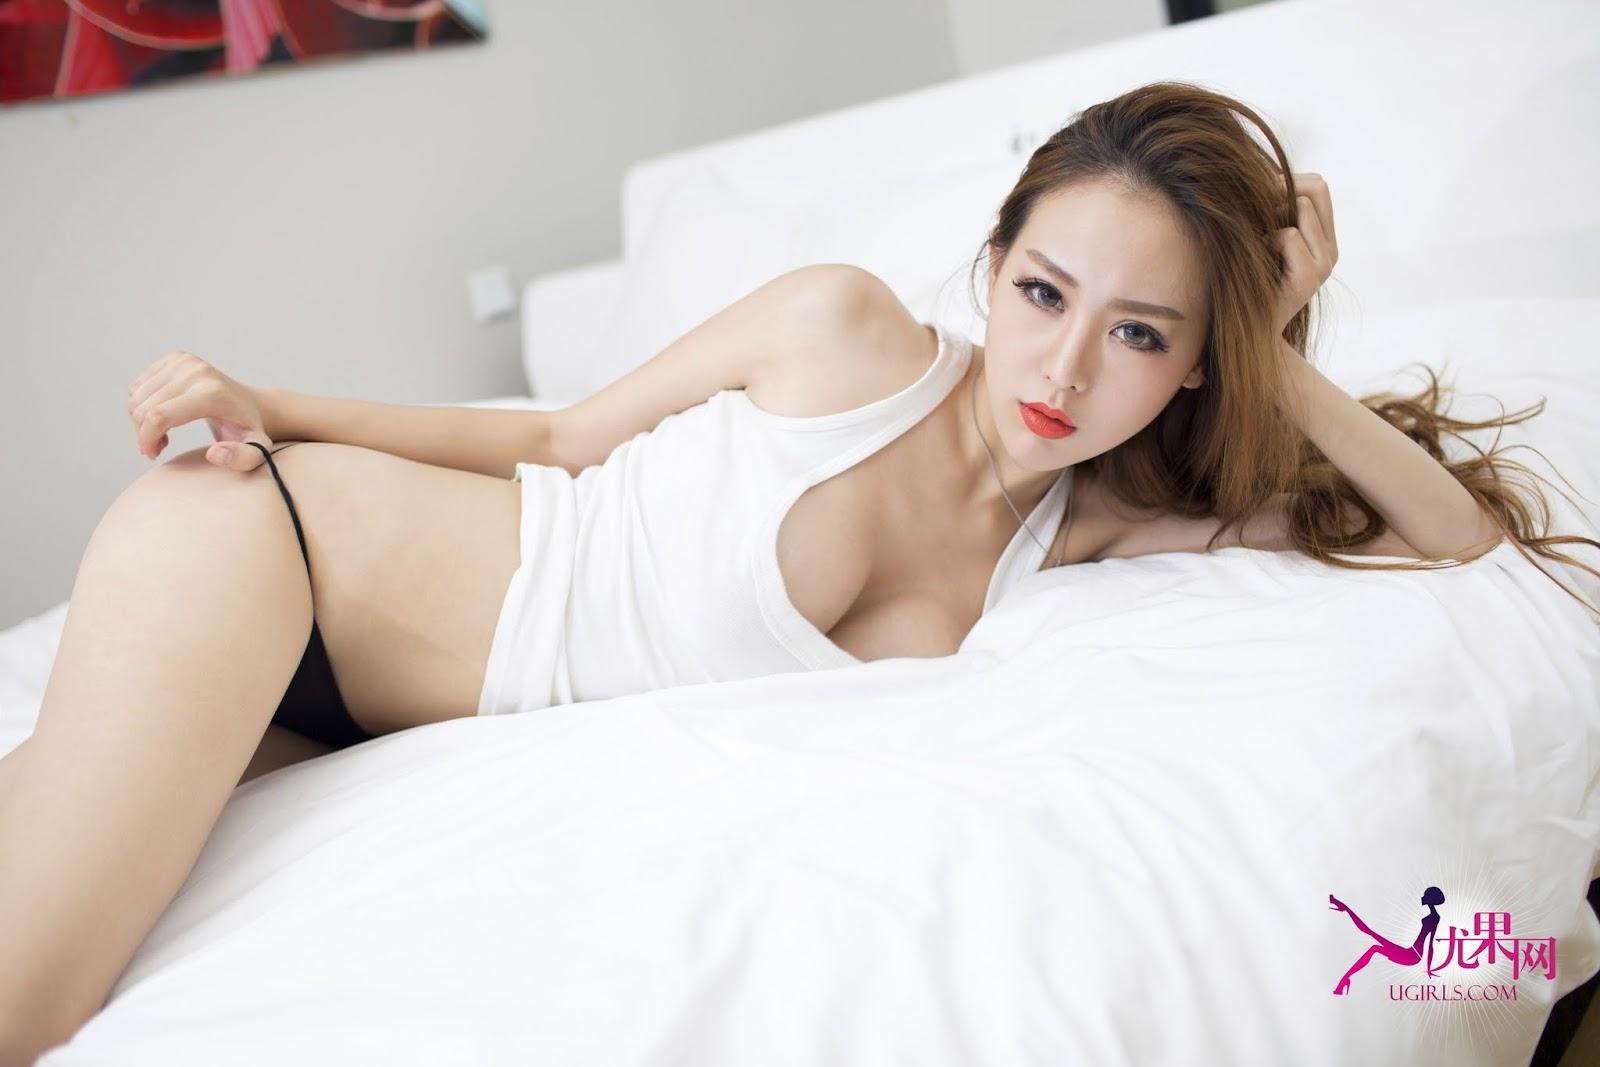 U091%2B%252846%2529 - Sexy Photo UGIRLS NO.91 Nude Girl